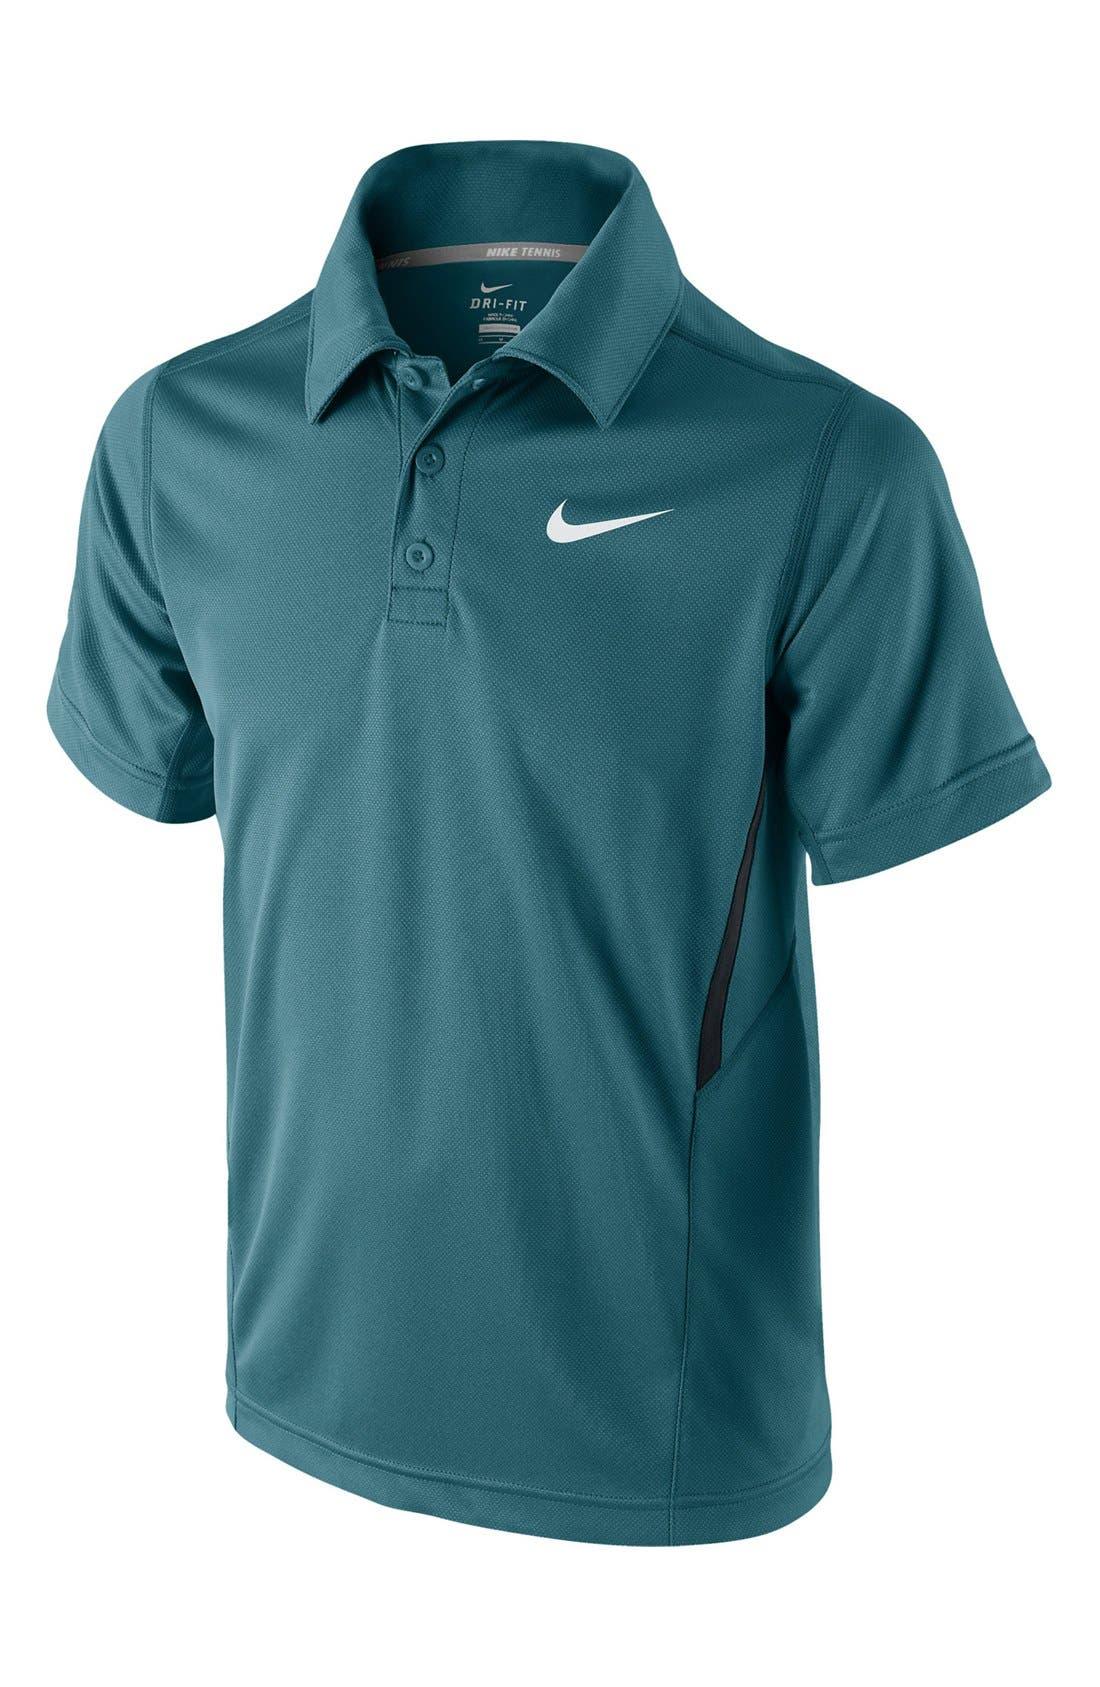 Main Image - Nike 'Boarder' Tennis Polo (Big Boys)